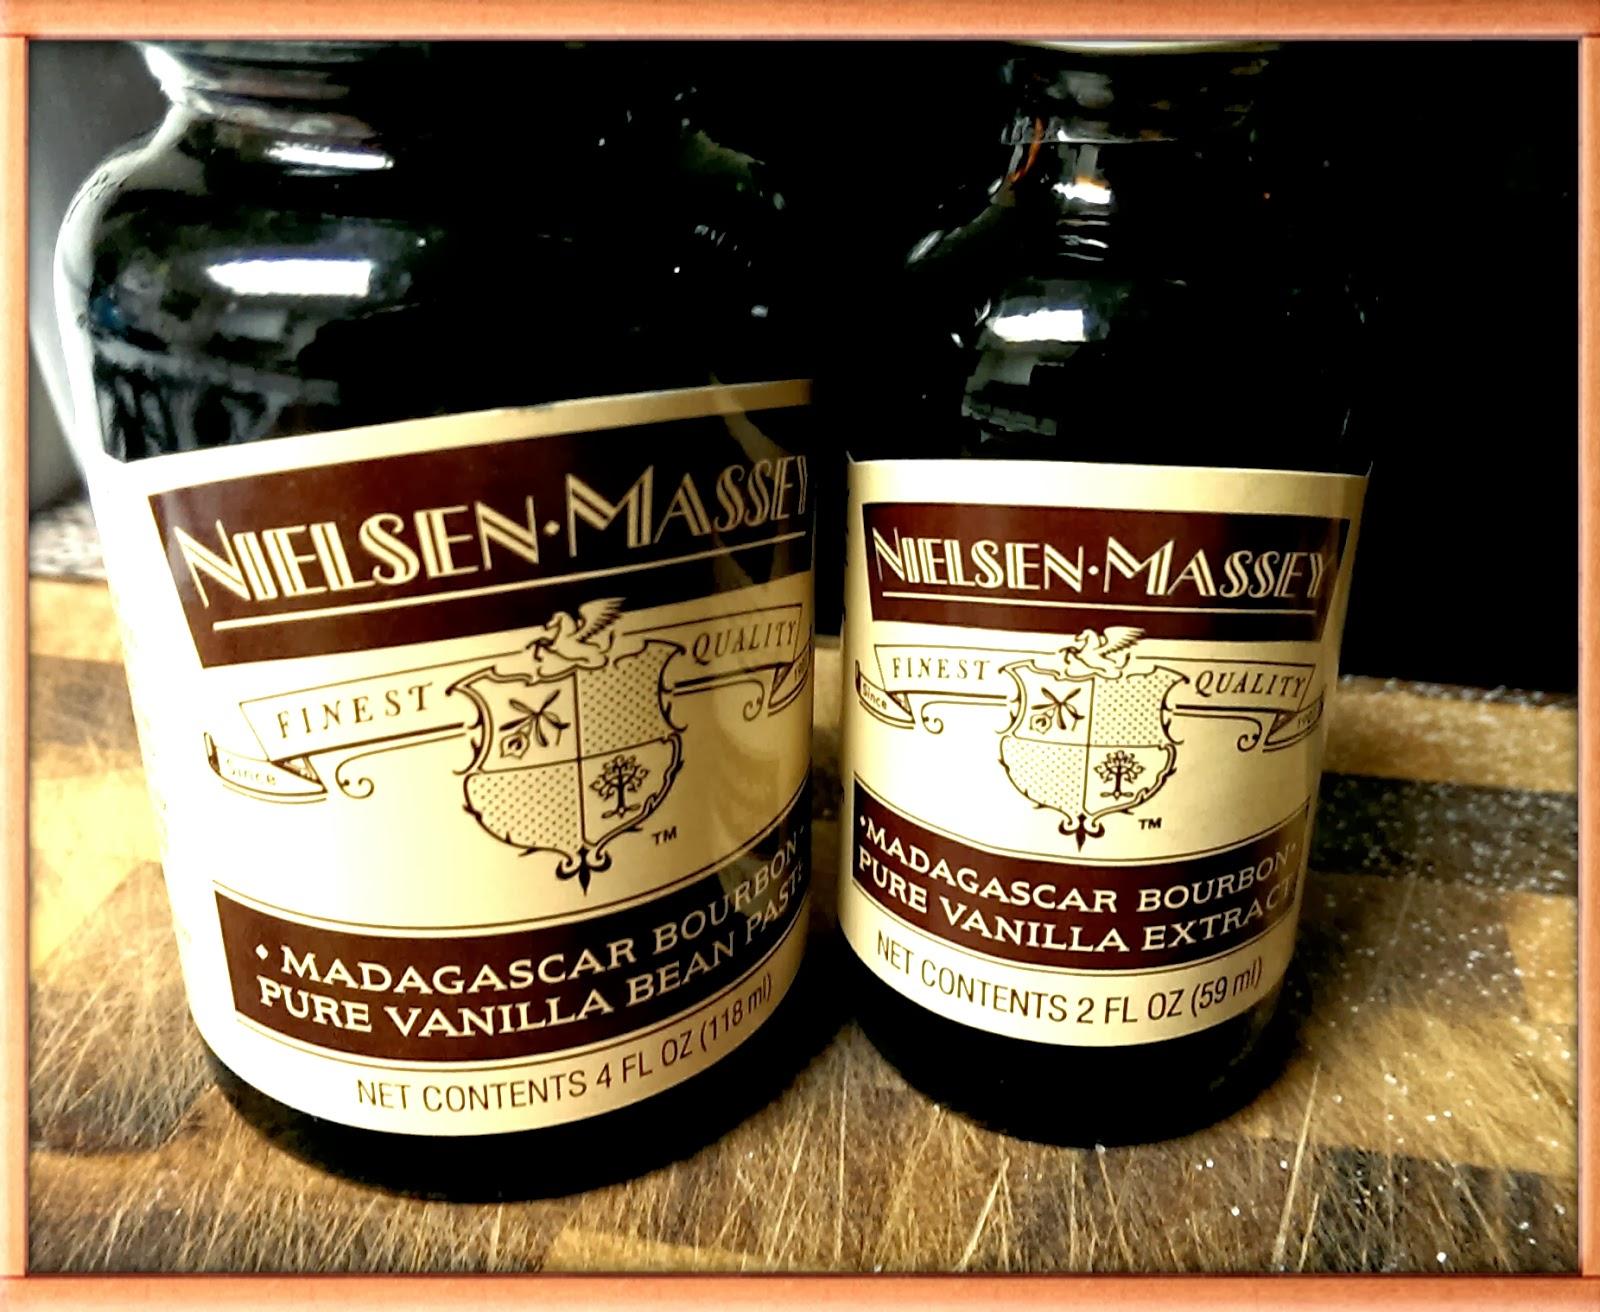 nielsen+massey+pure+vanilla Celebrate Mardi Gras With New Orleans Beignets- Nielsen Massey Vanillas Review